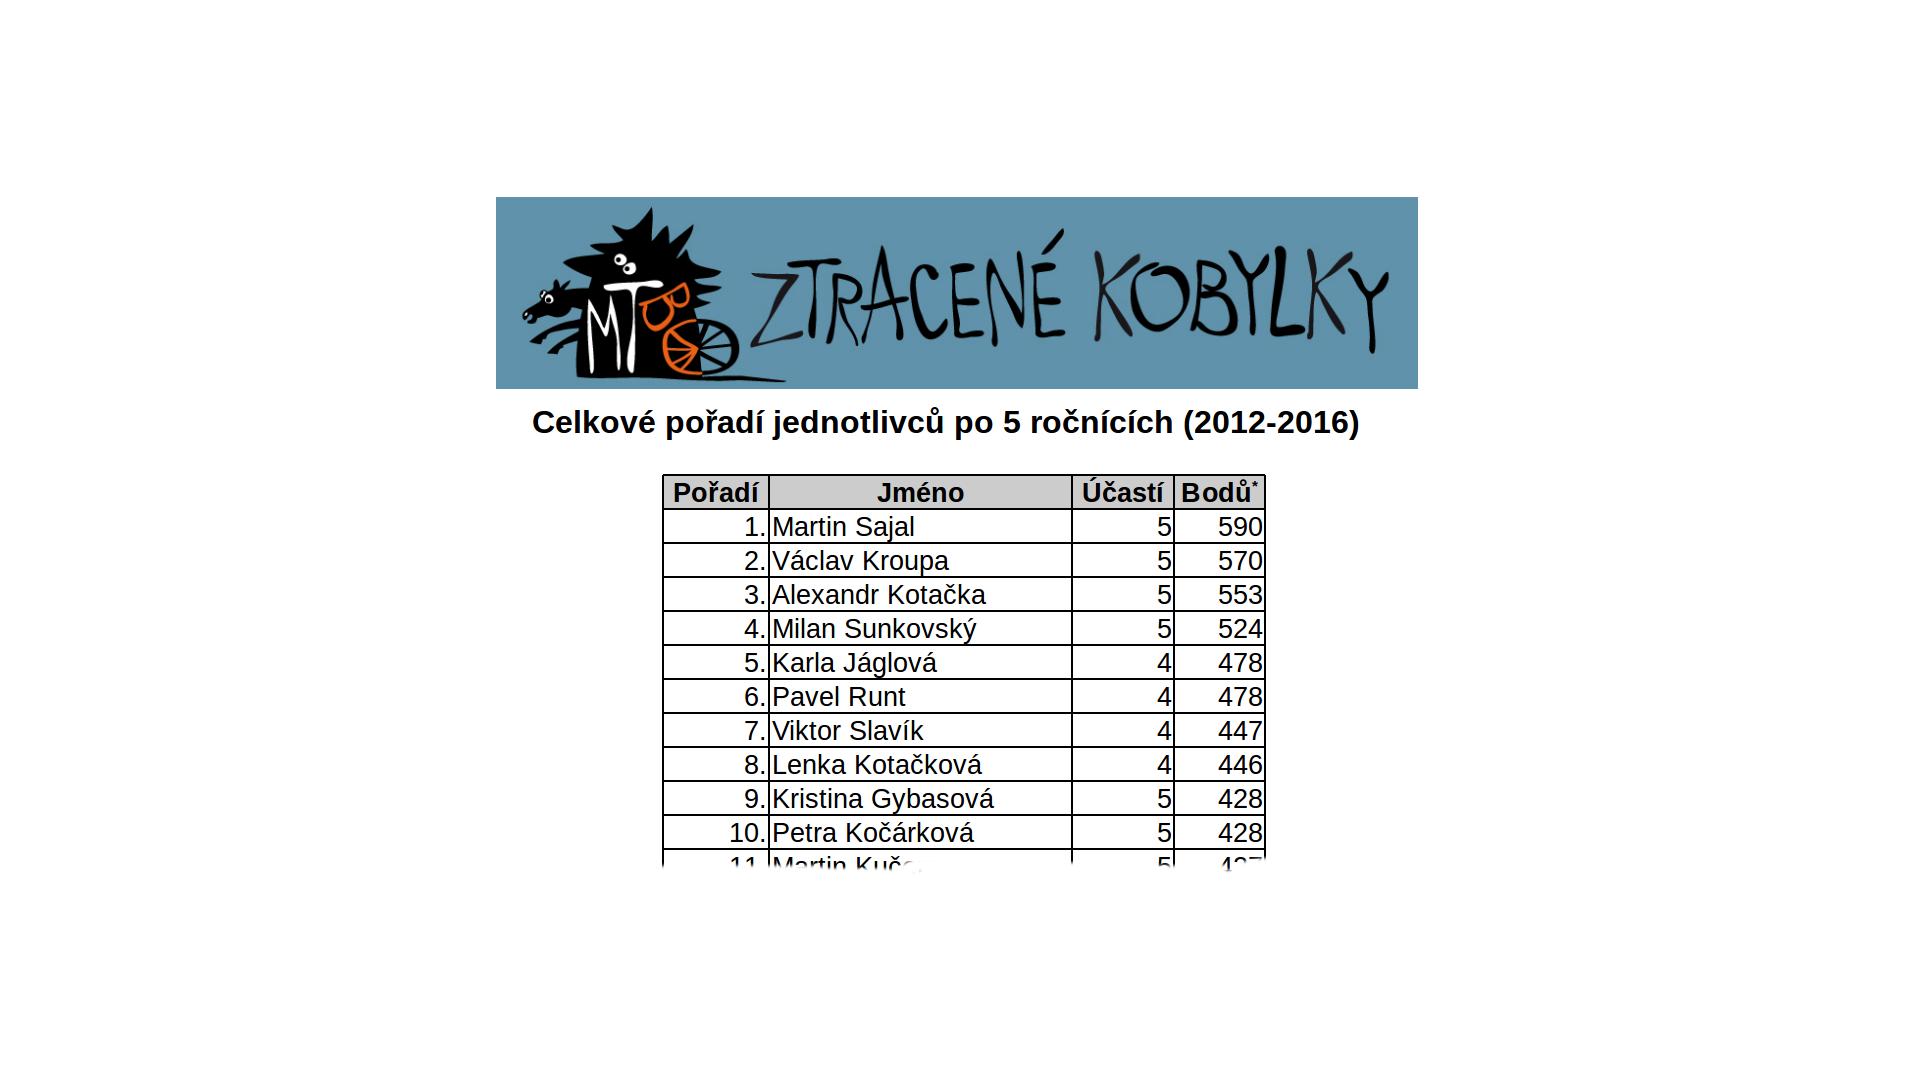 ztracene_kobylky_kumulovane_12-16_top10